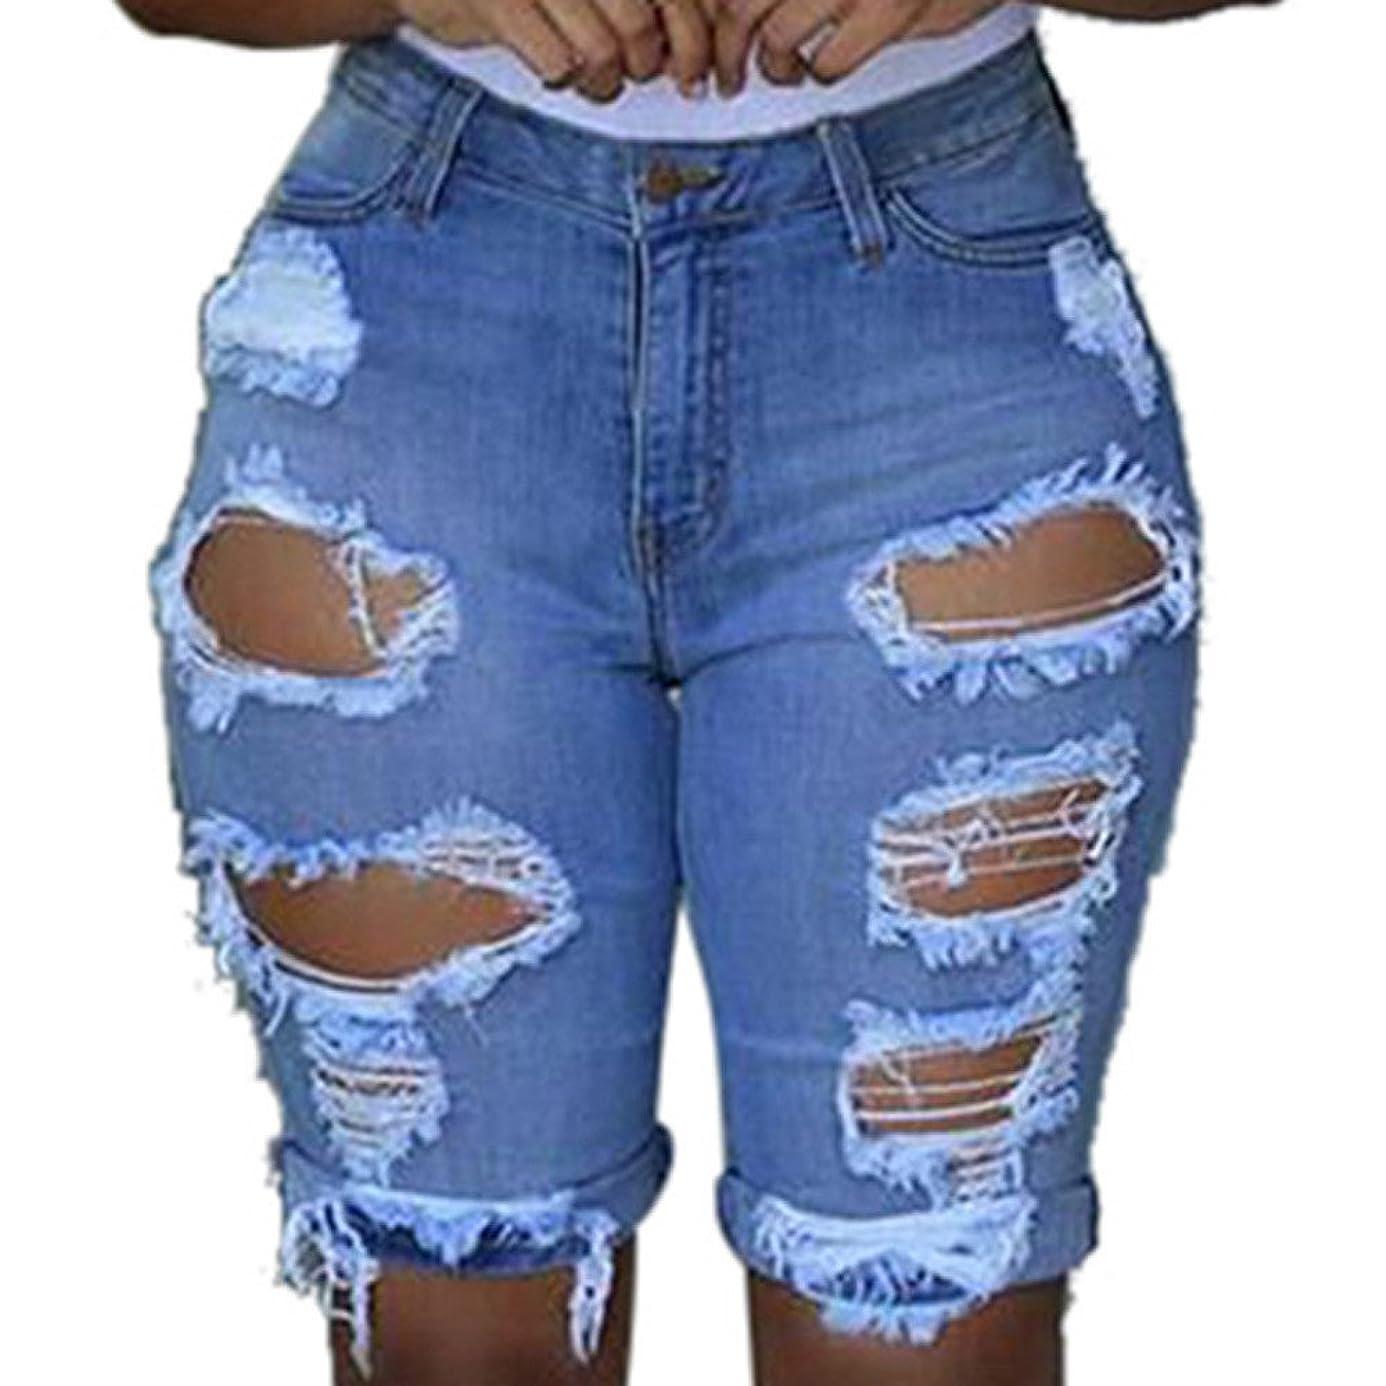 WEUIE Womens Clothing Womens Casual Elastic Denim Leggings Destroyed Bermuda Shorts Jeans Pants